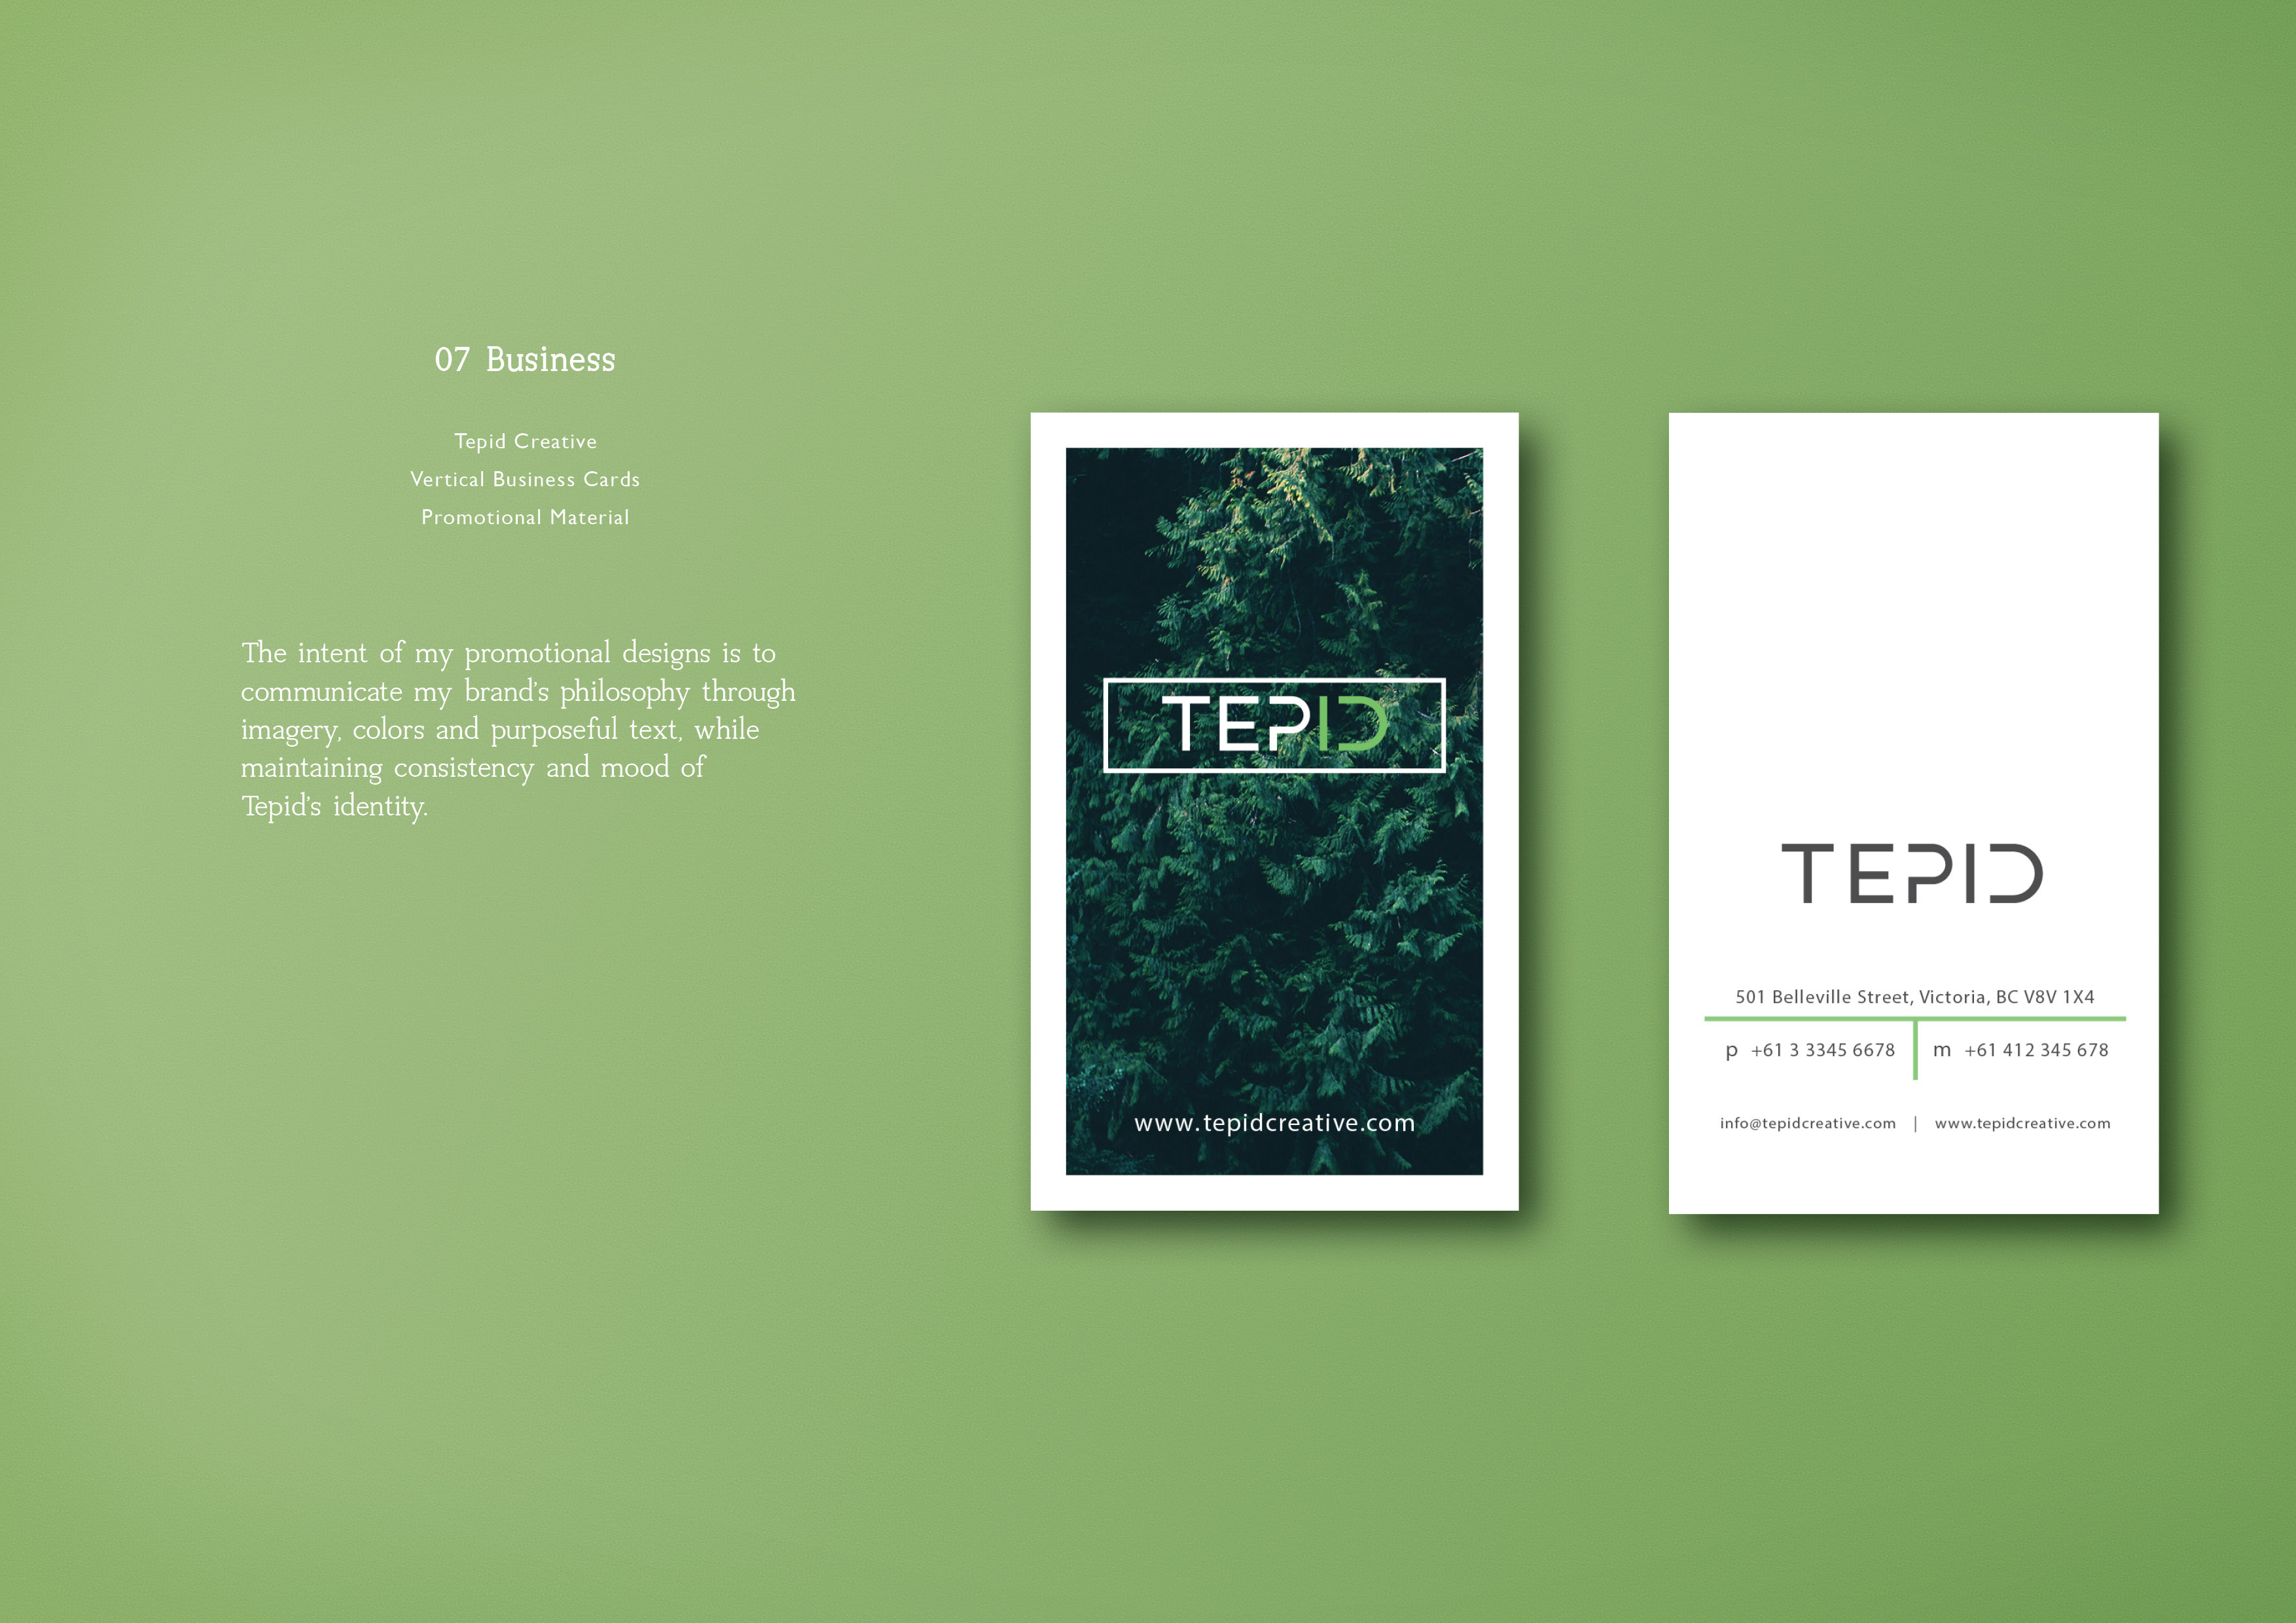 Tepid Sustainable Design & Branding Identity on Behance